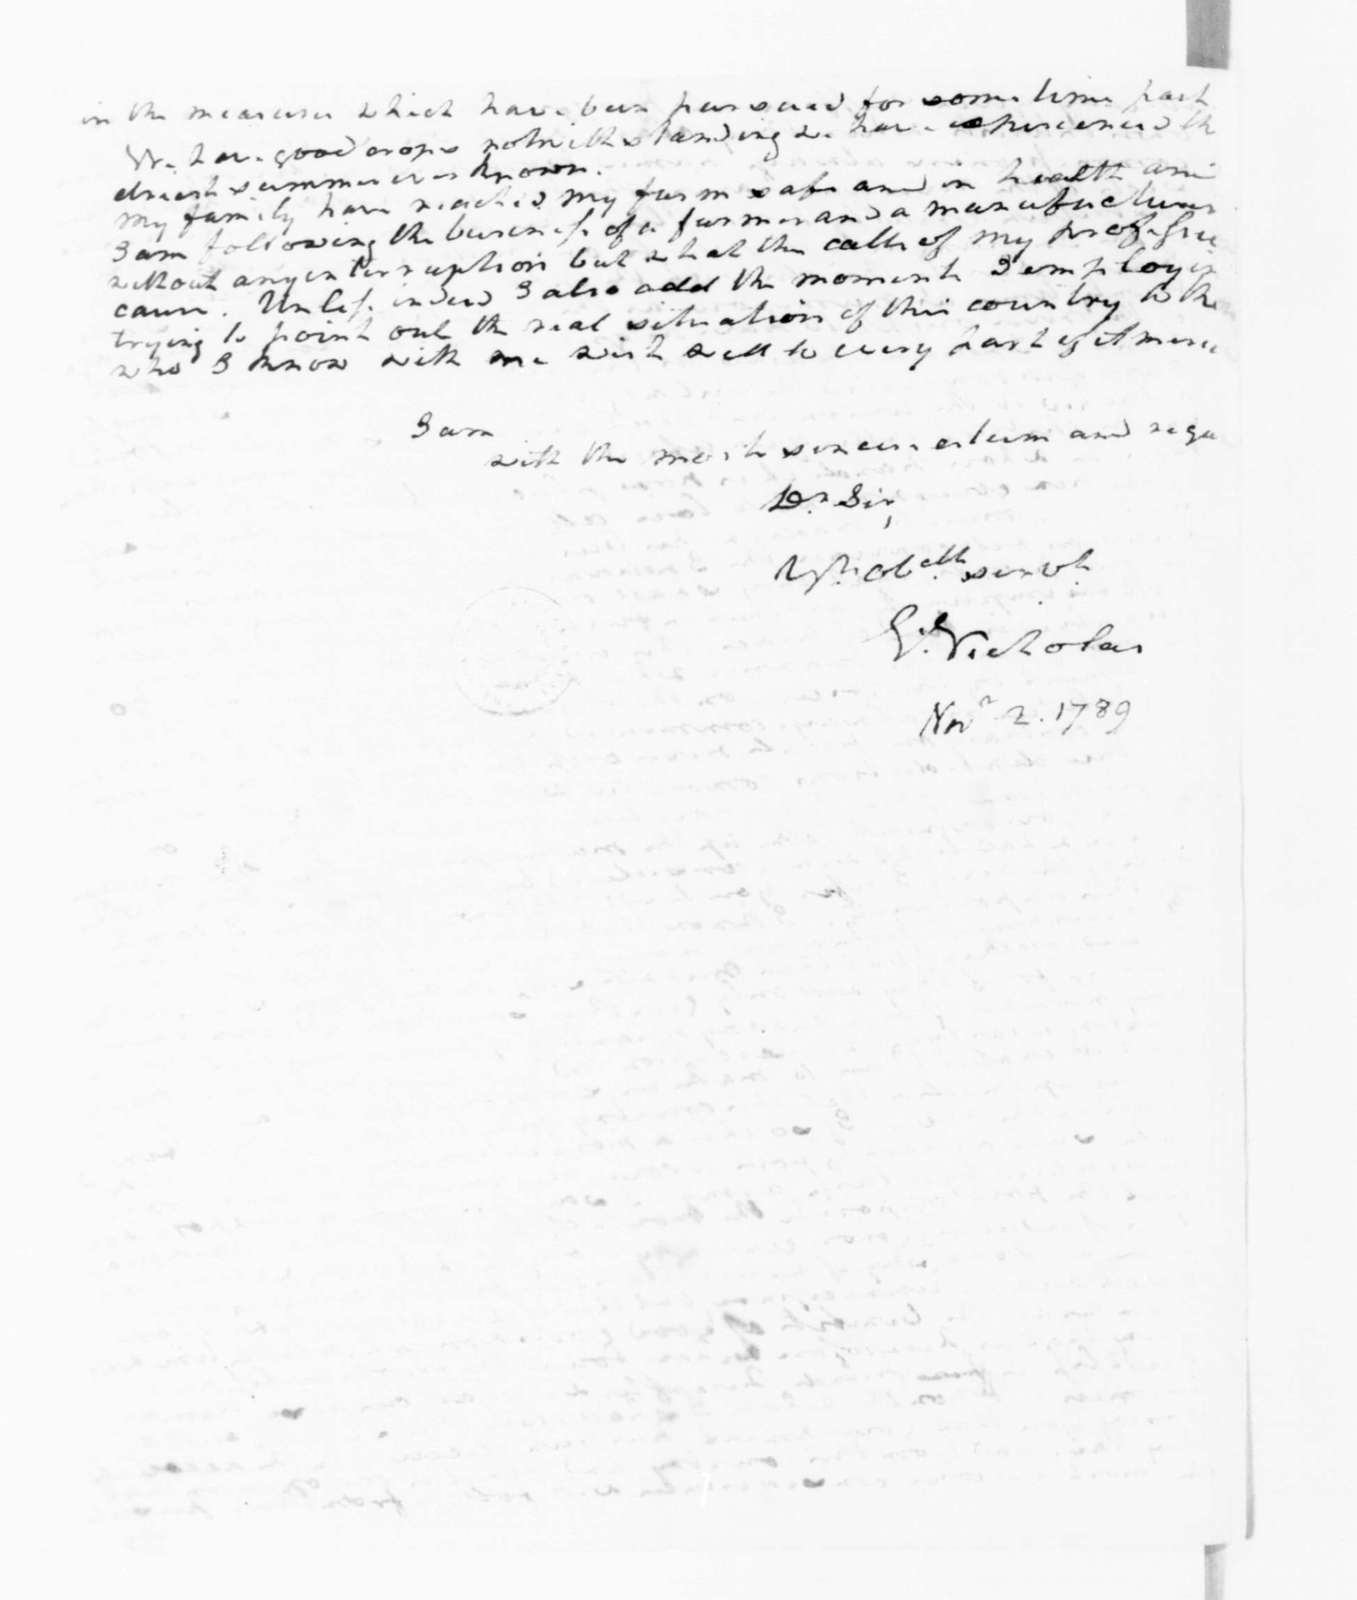 George Nicholas to James Madison, November 2, 1789.